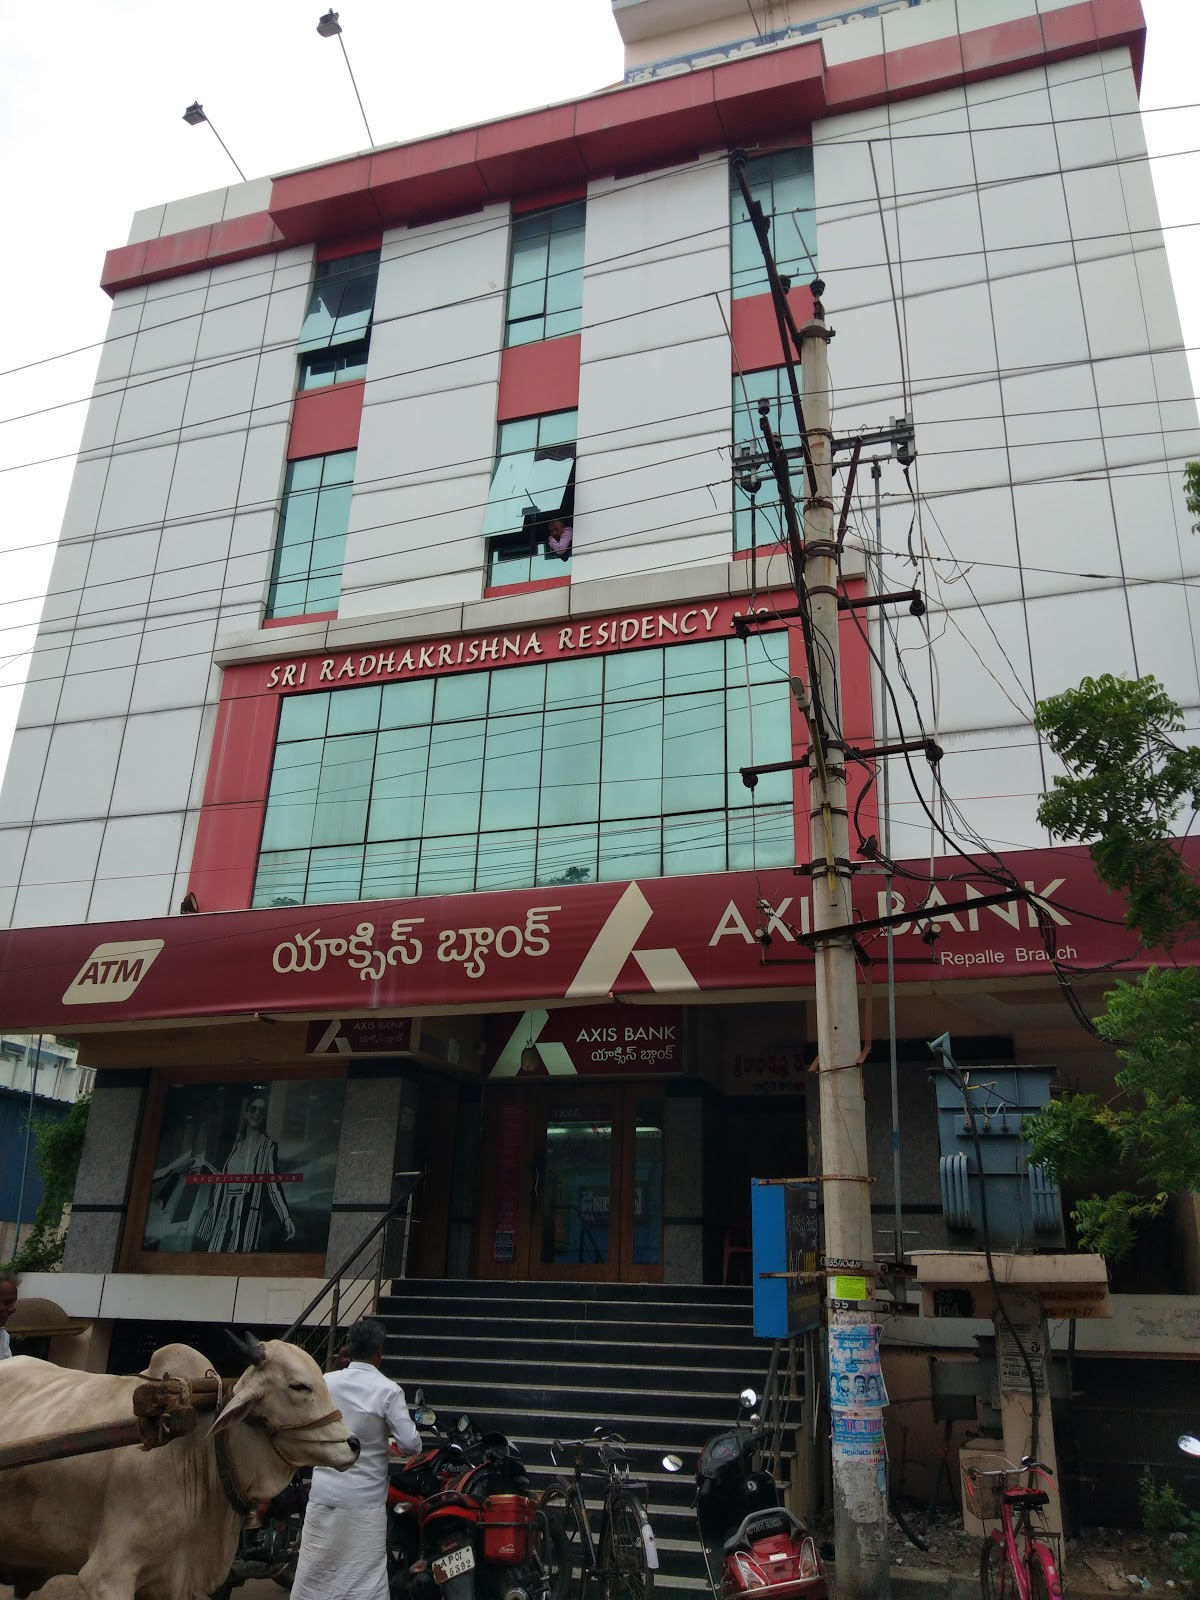 blood bank Axis Bank near Guntur Andhra Pradesh